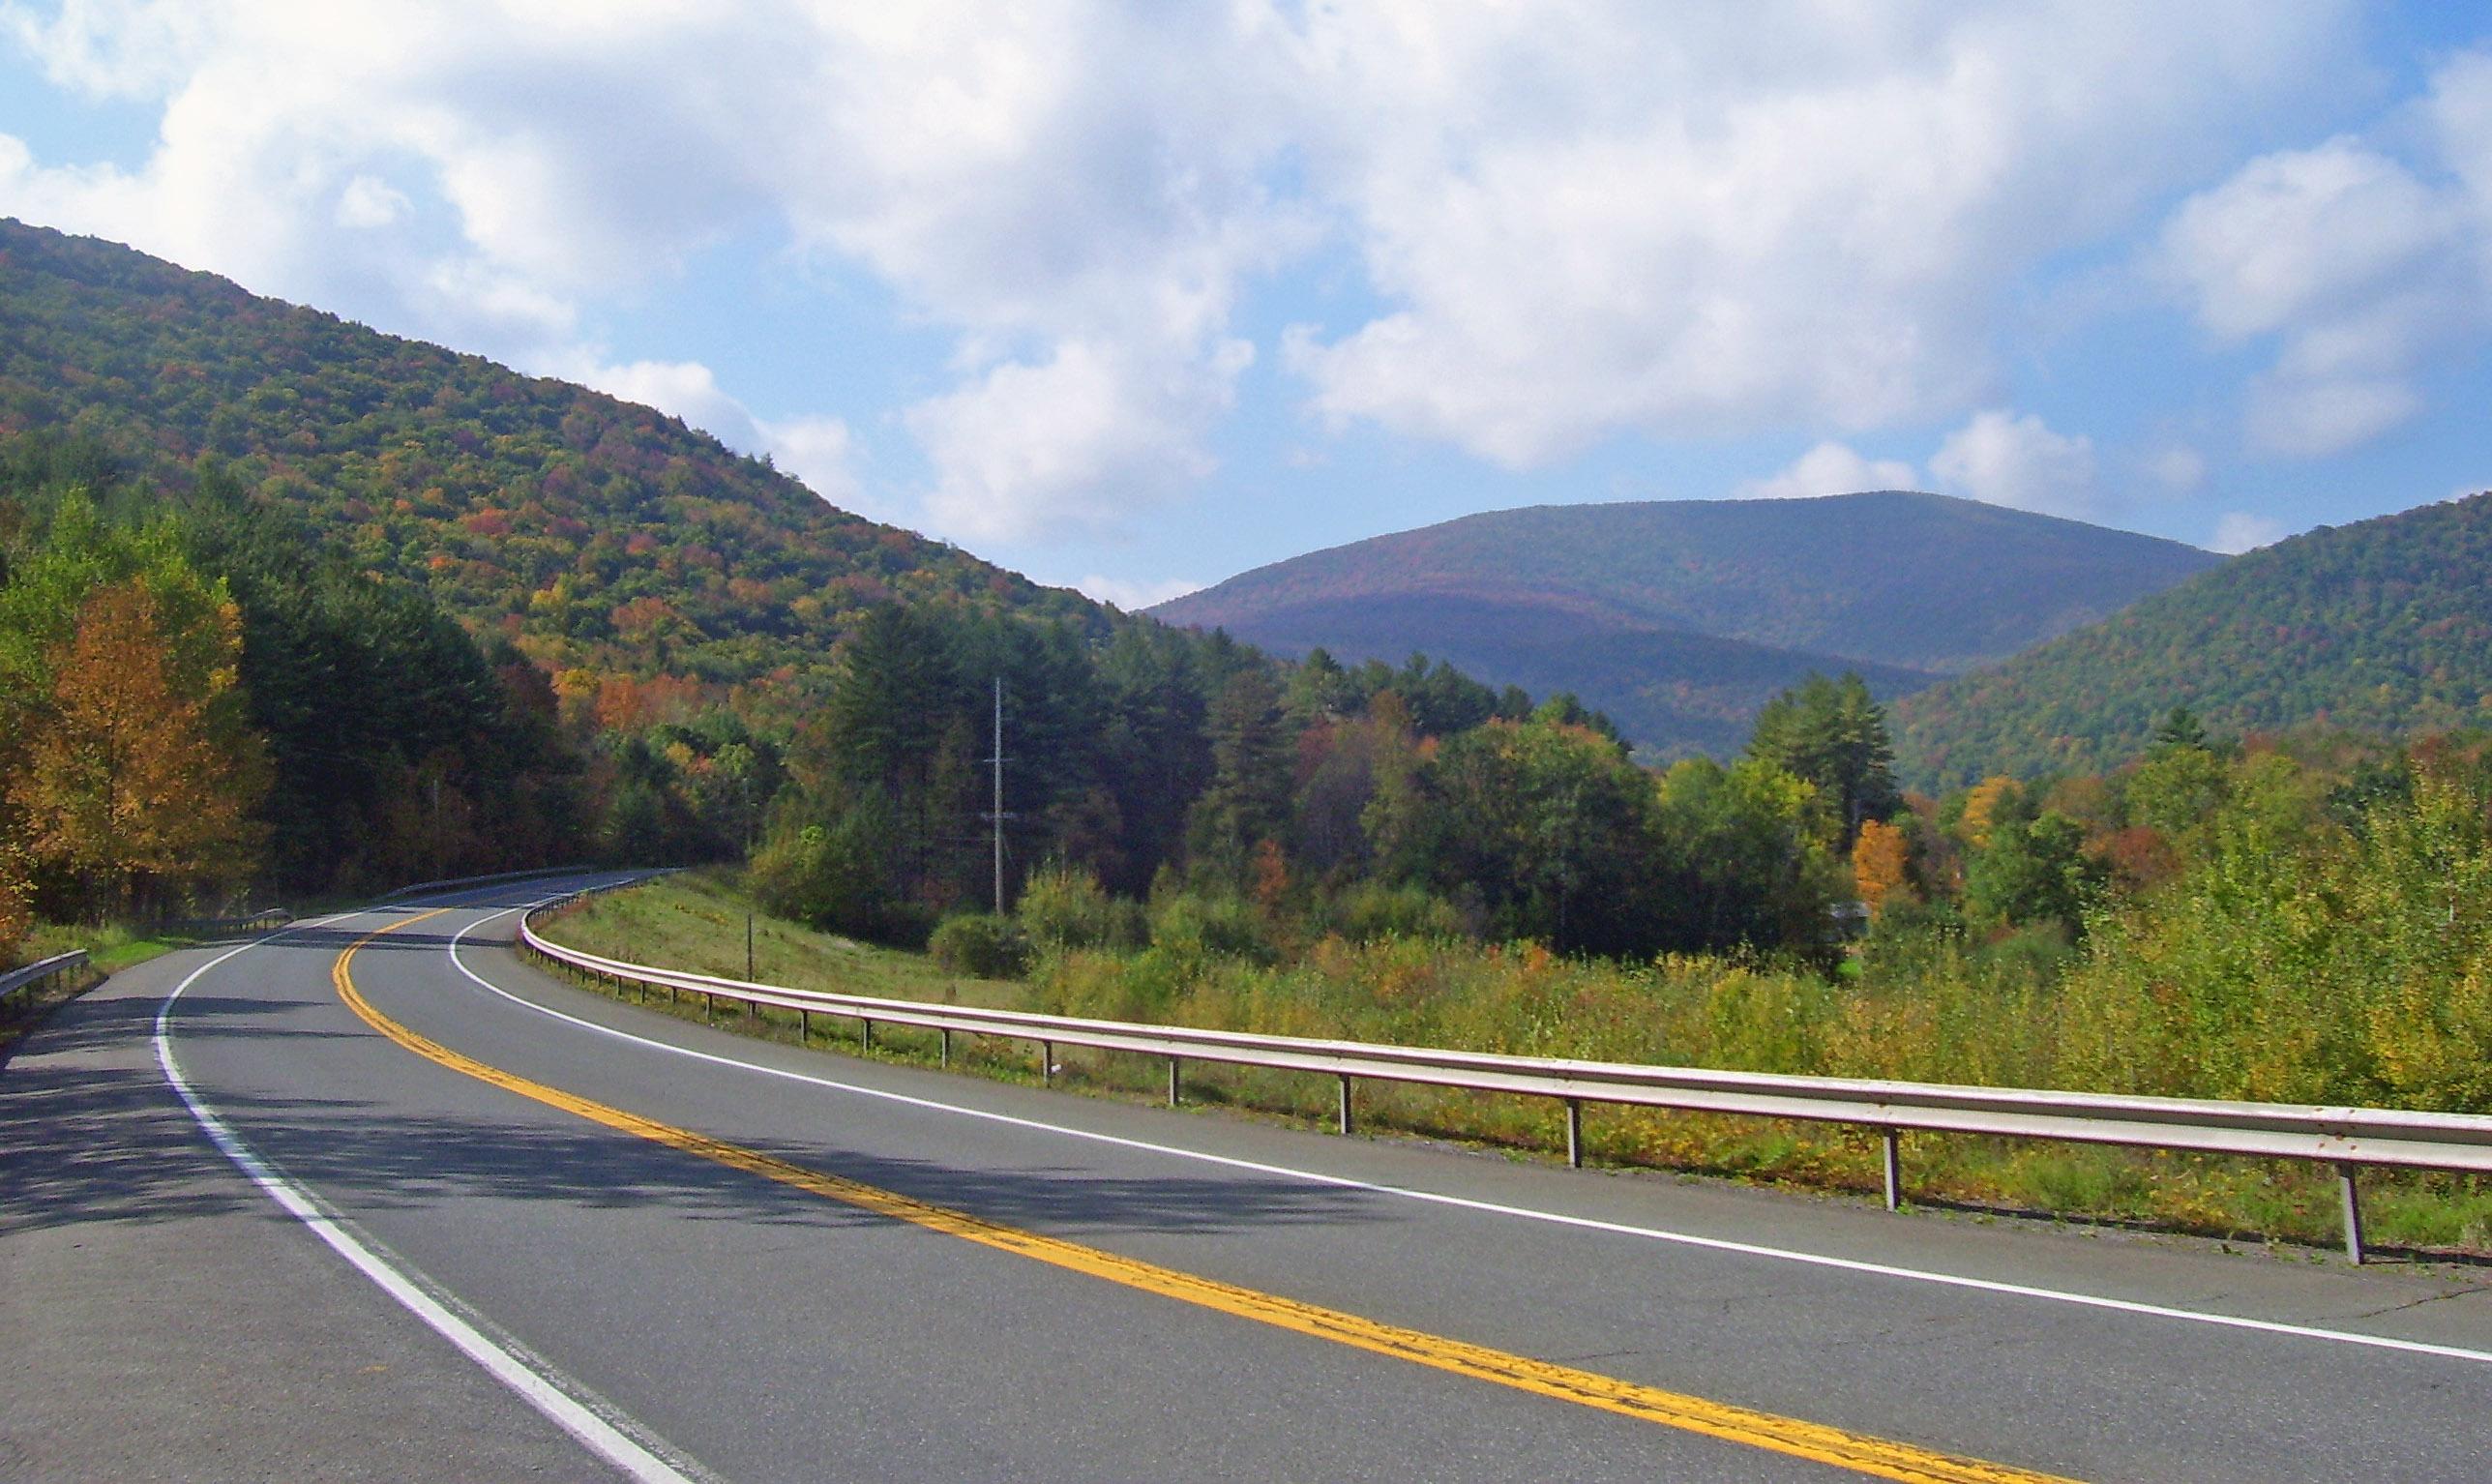 Balsam_Mountain_and_NY_28